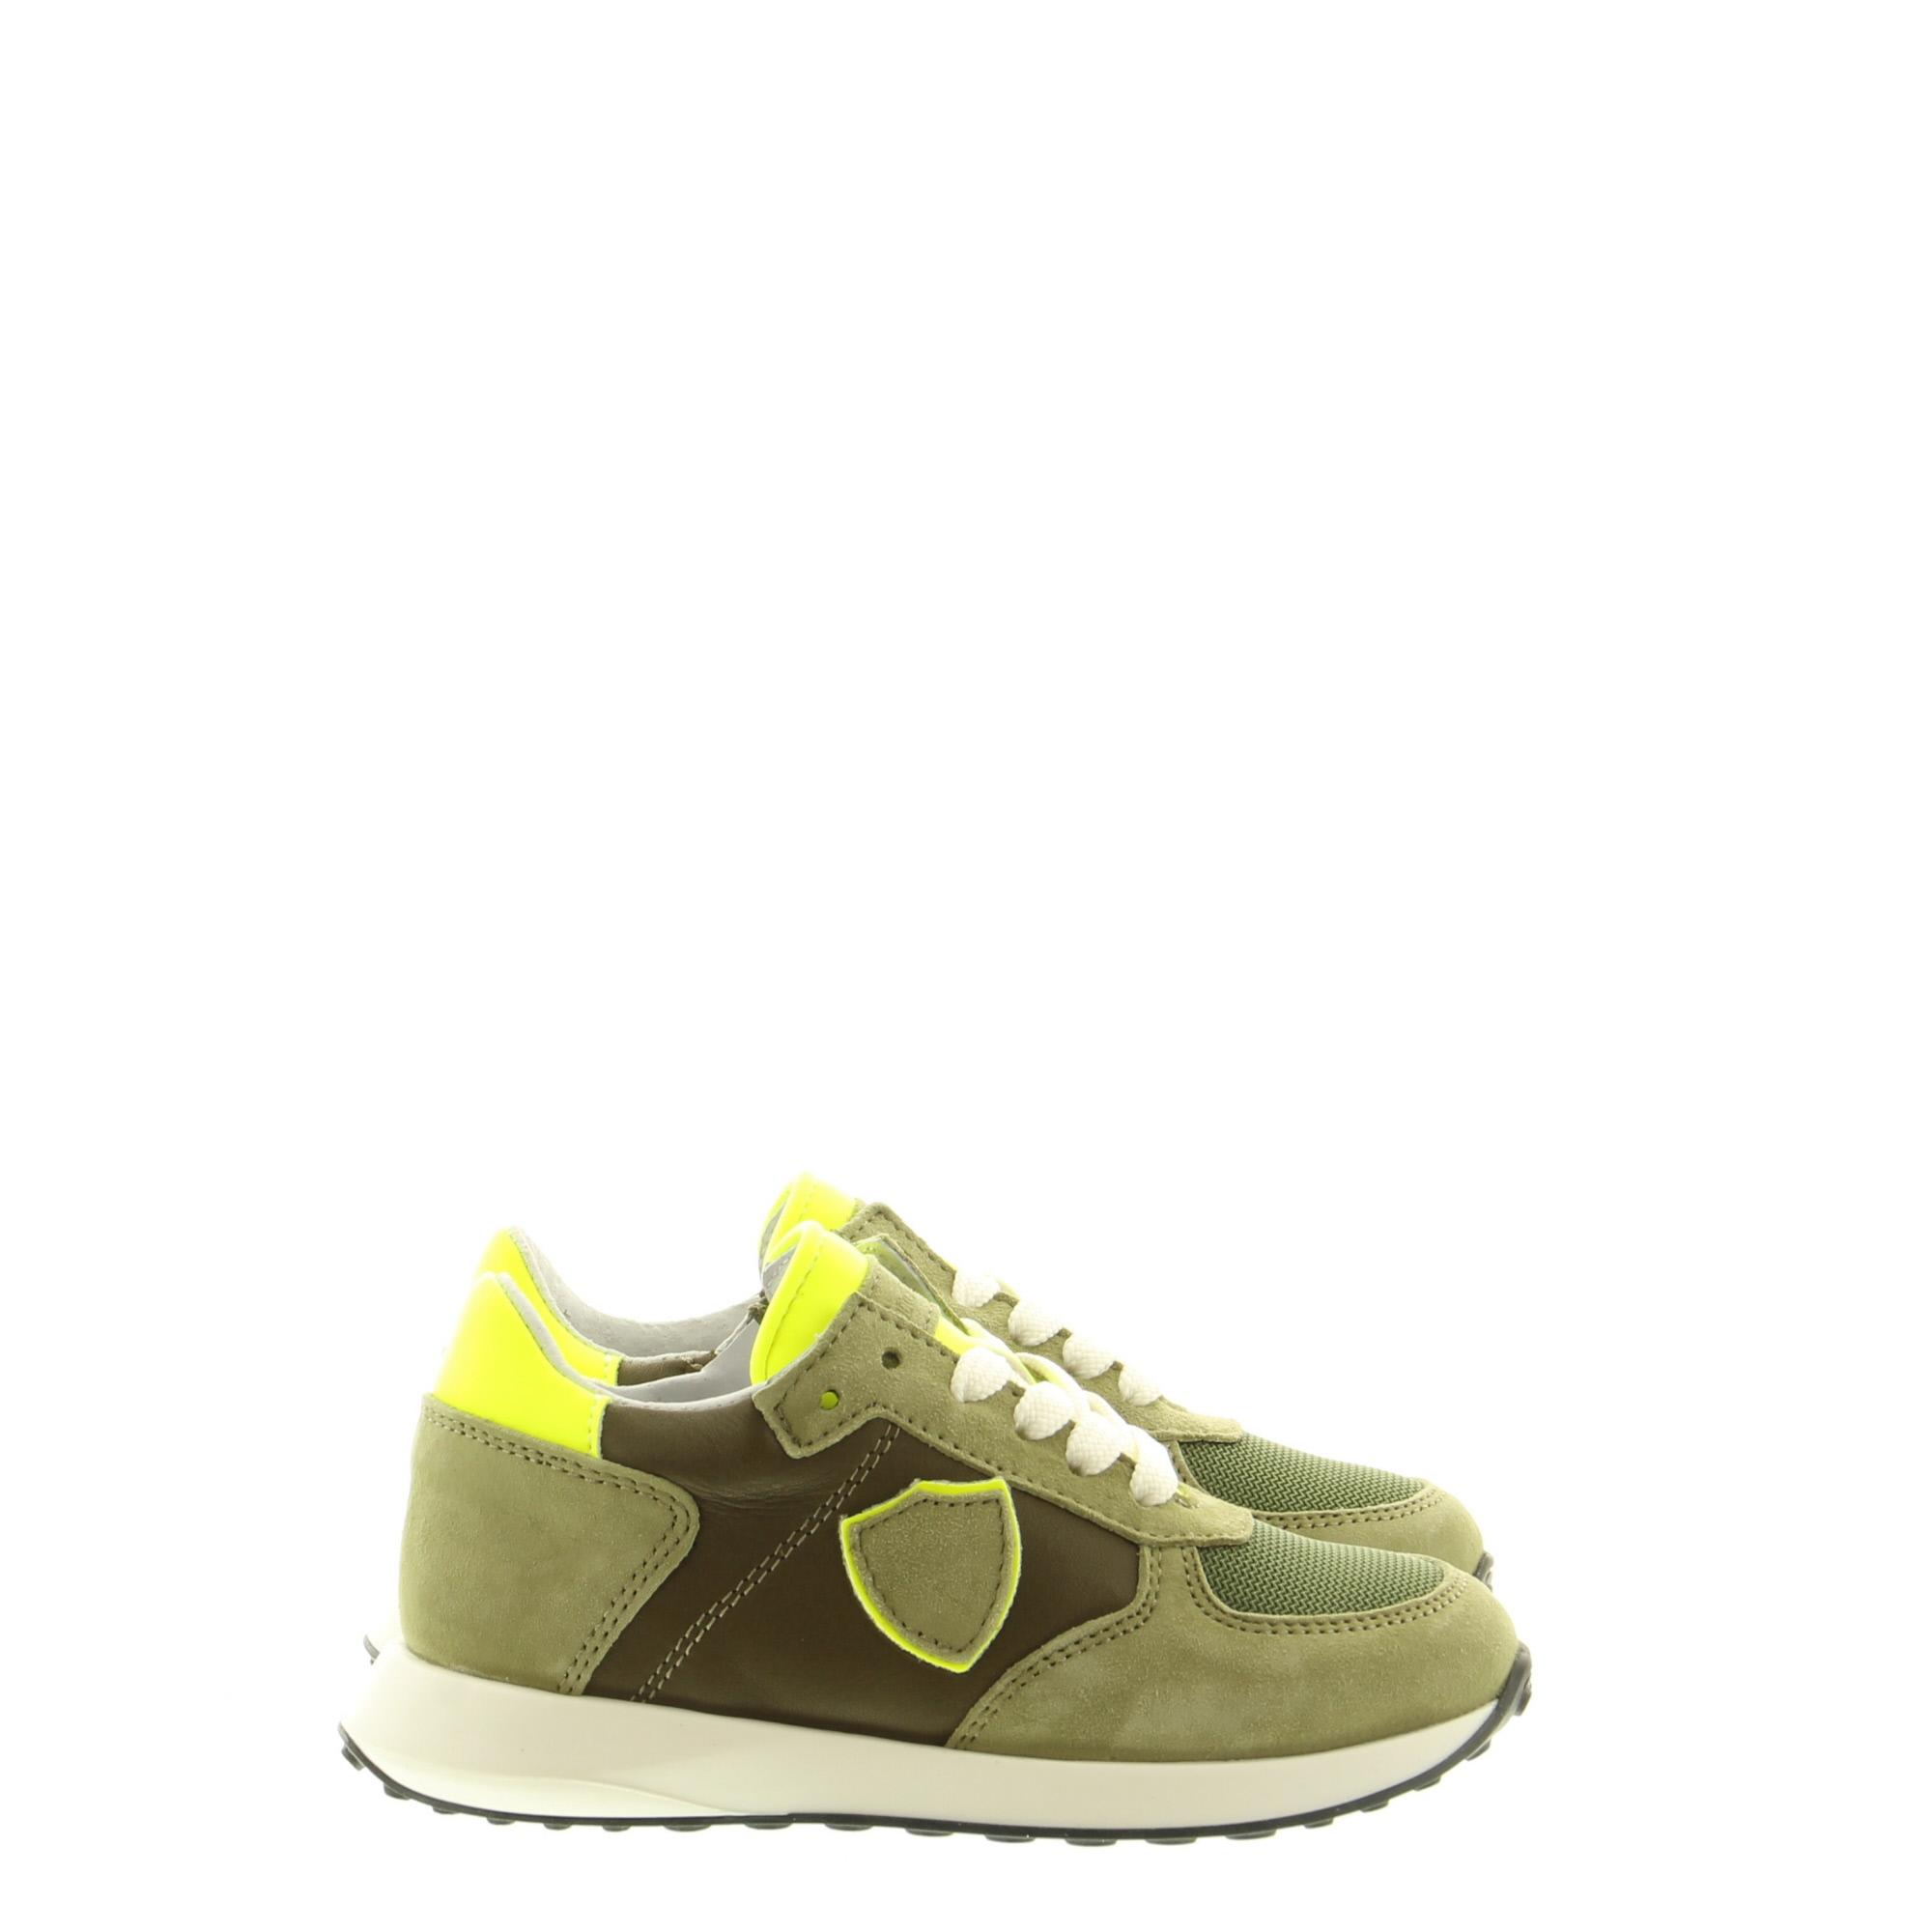 Pinocchio P1776 65CO Green